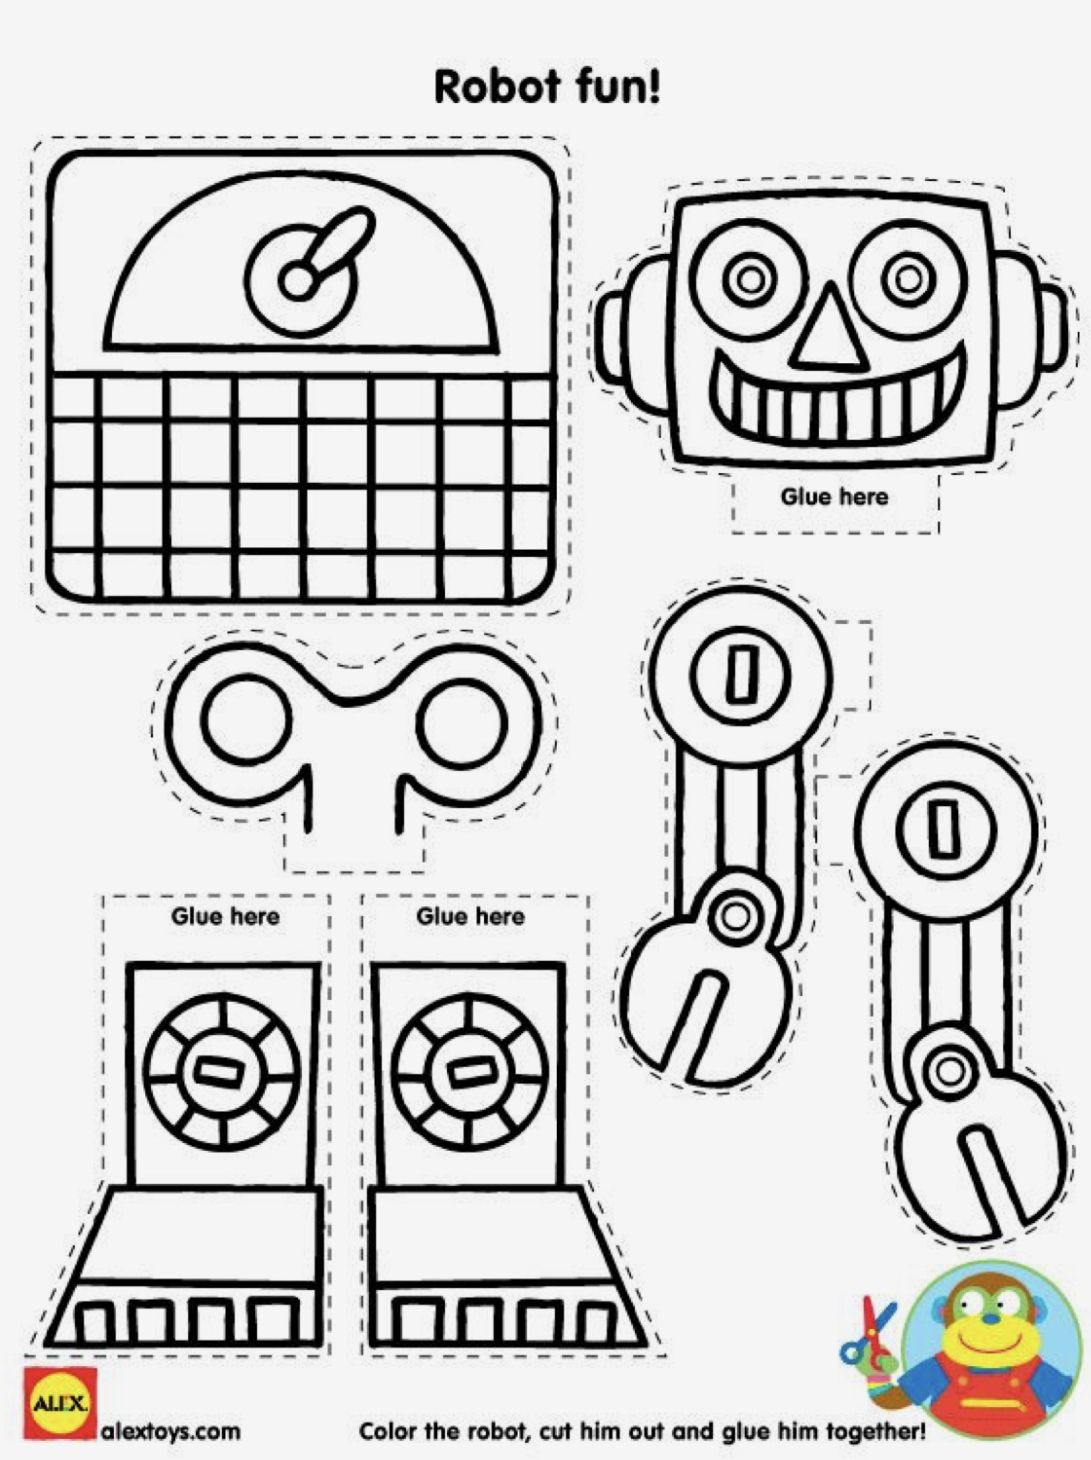 Pin von Andrea Matos auf Roboter spiele in 9  Roboter, Roboter